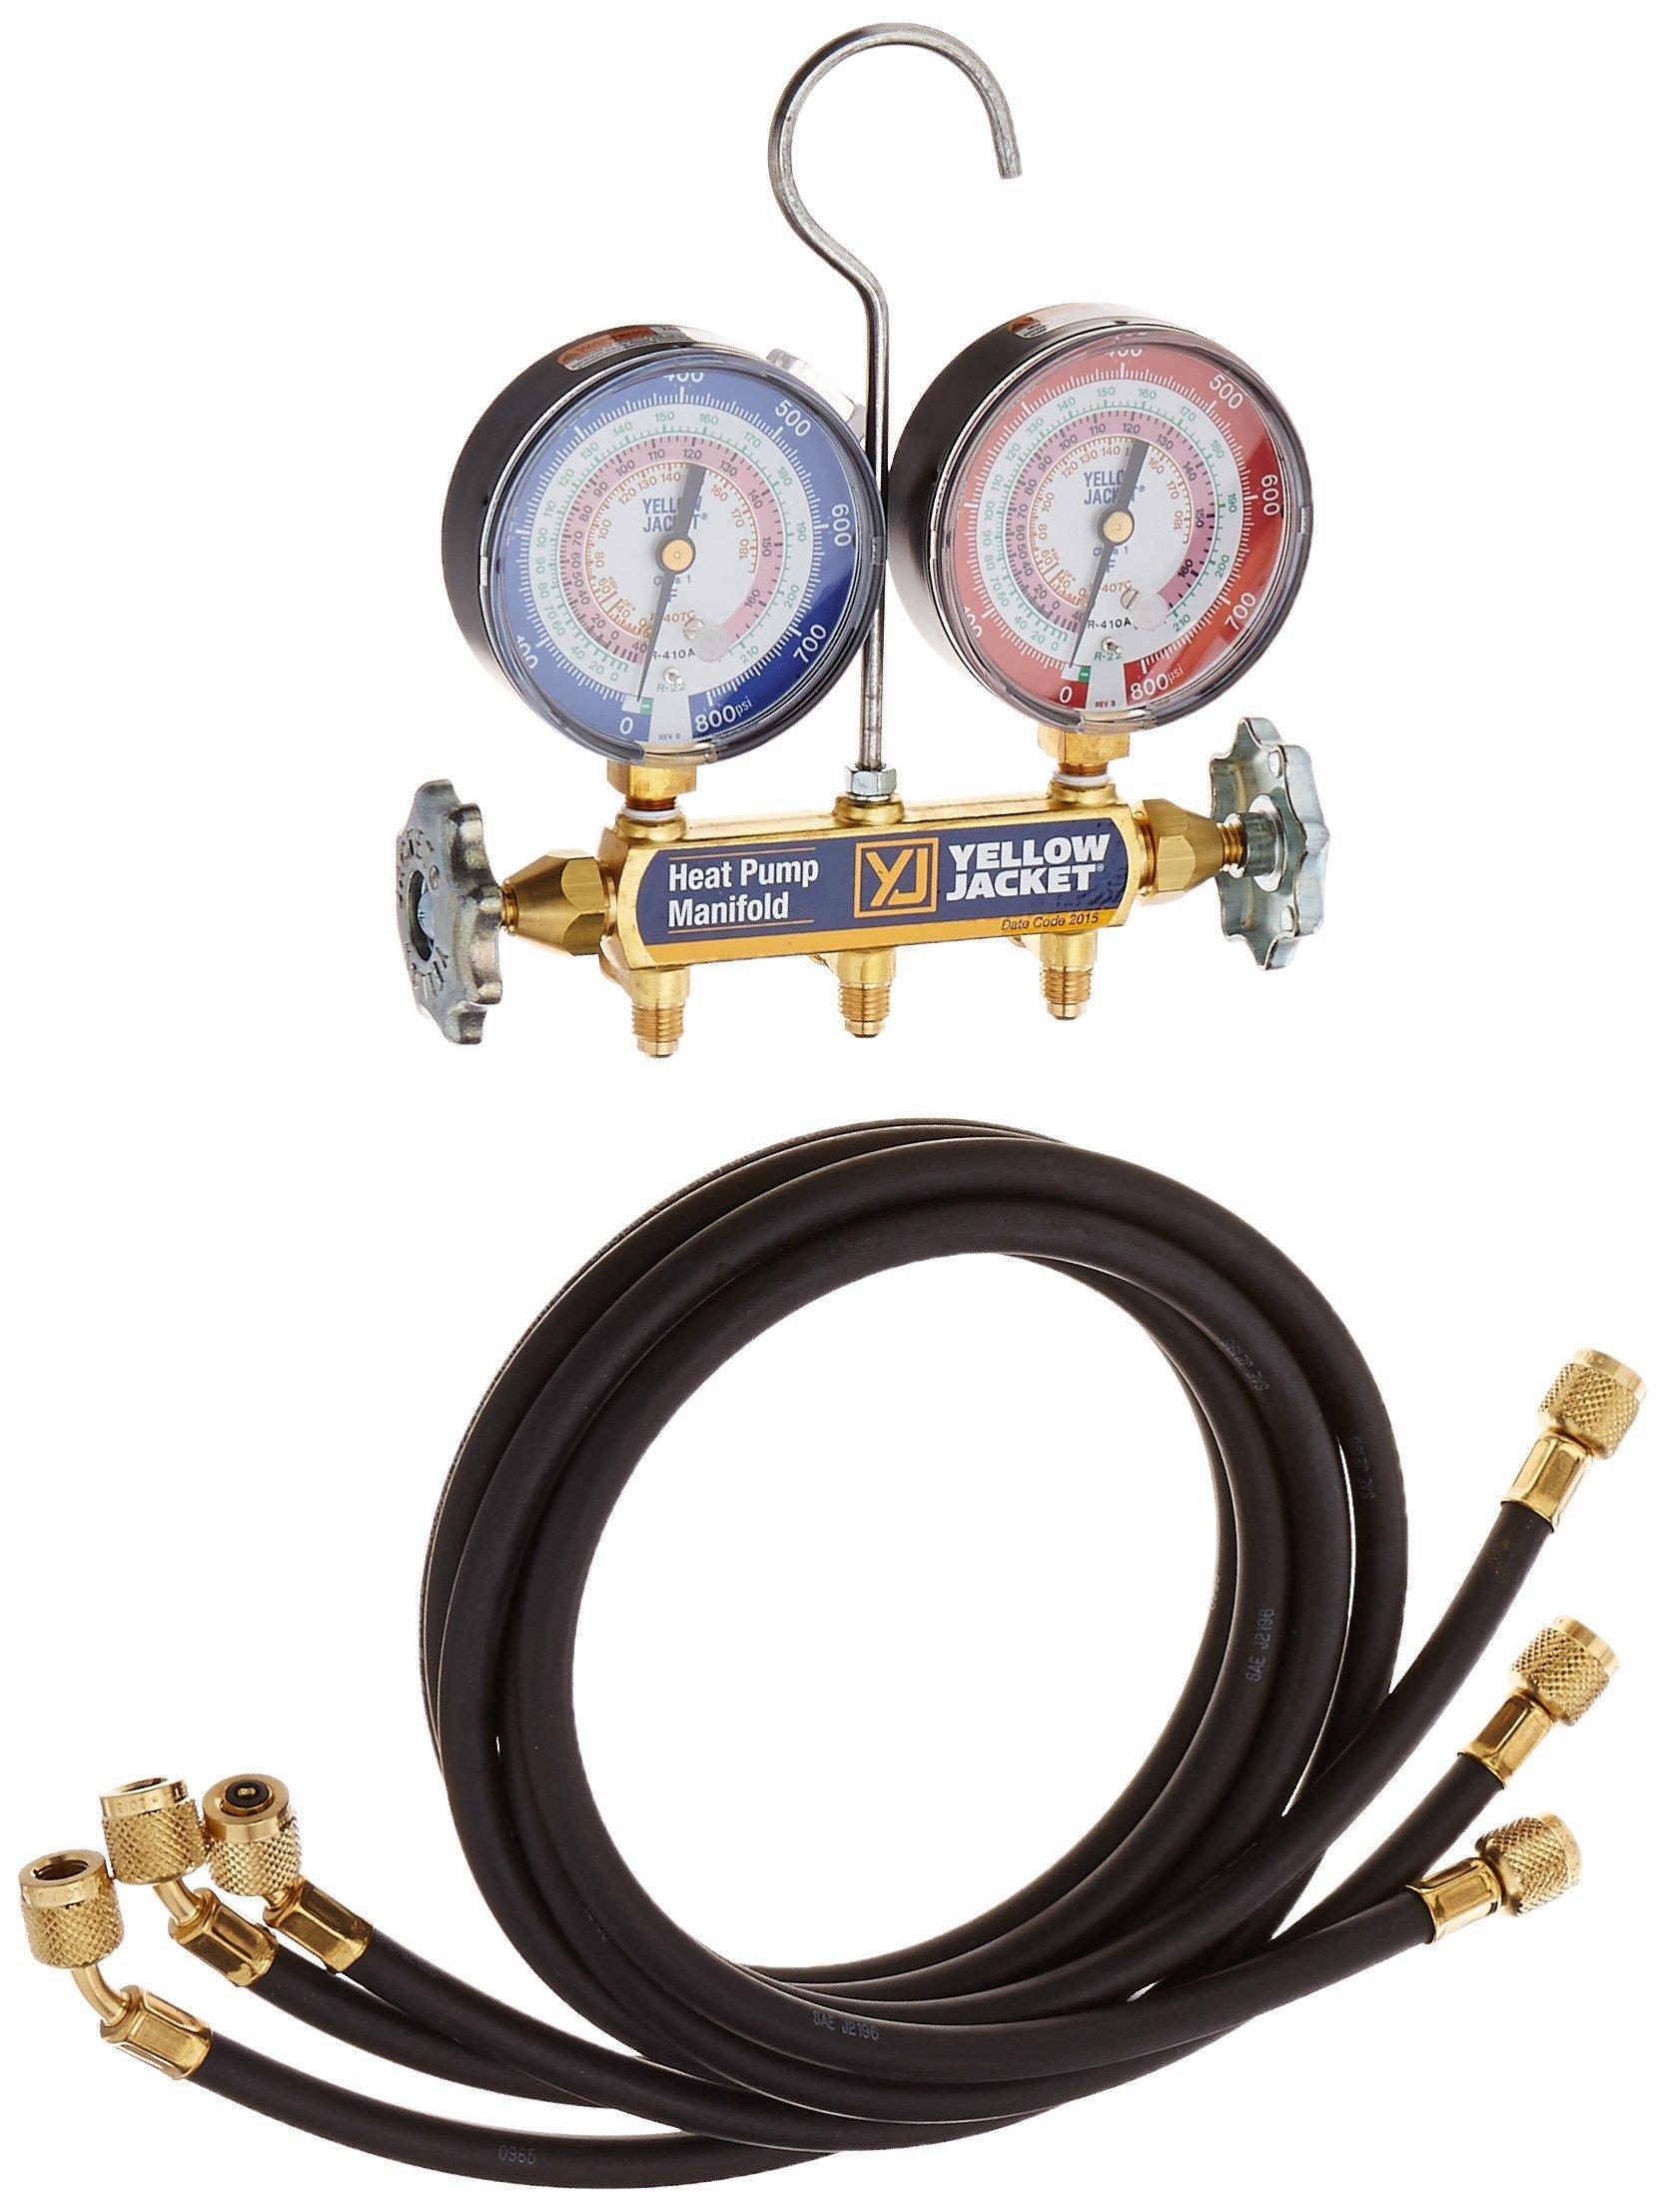 Yellow Jacket 42044 Heat Pump Manifold with 60'' Black Plus II 1/4'' Hoses, R-22/407C/410A